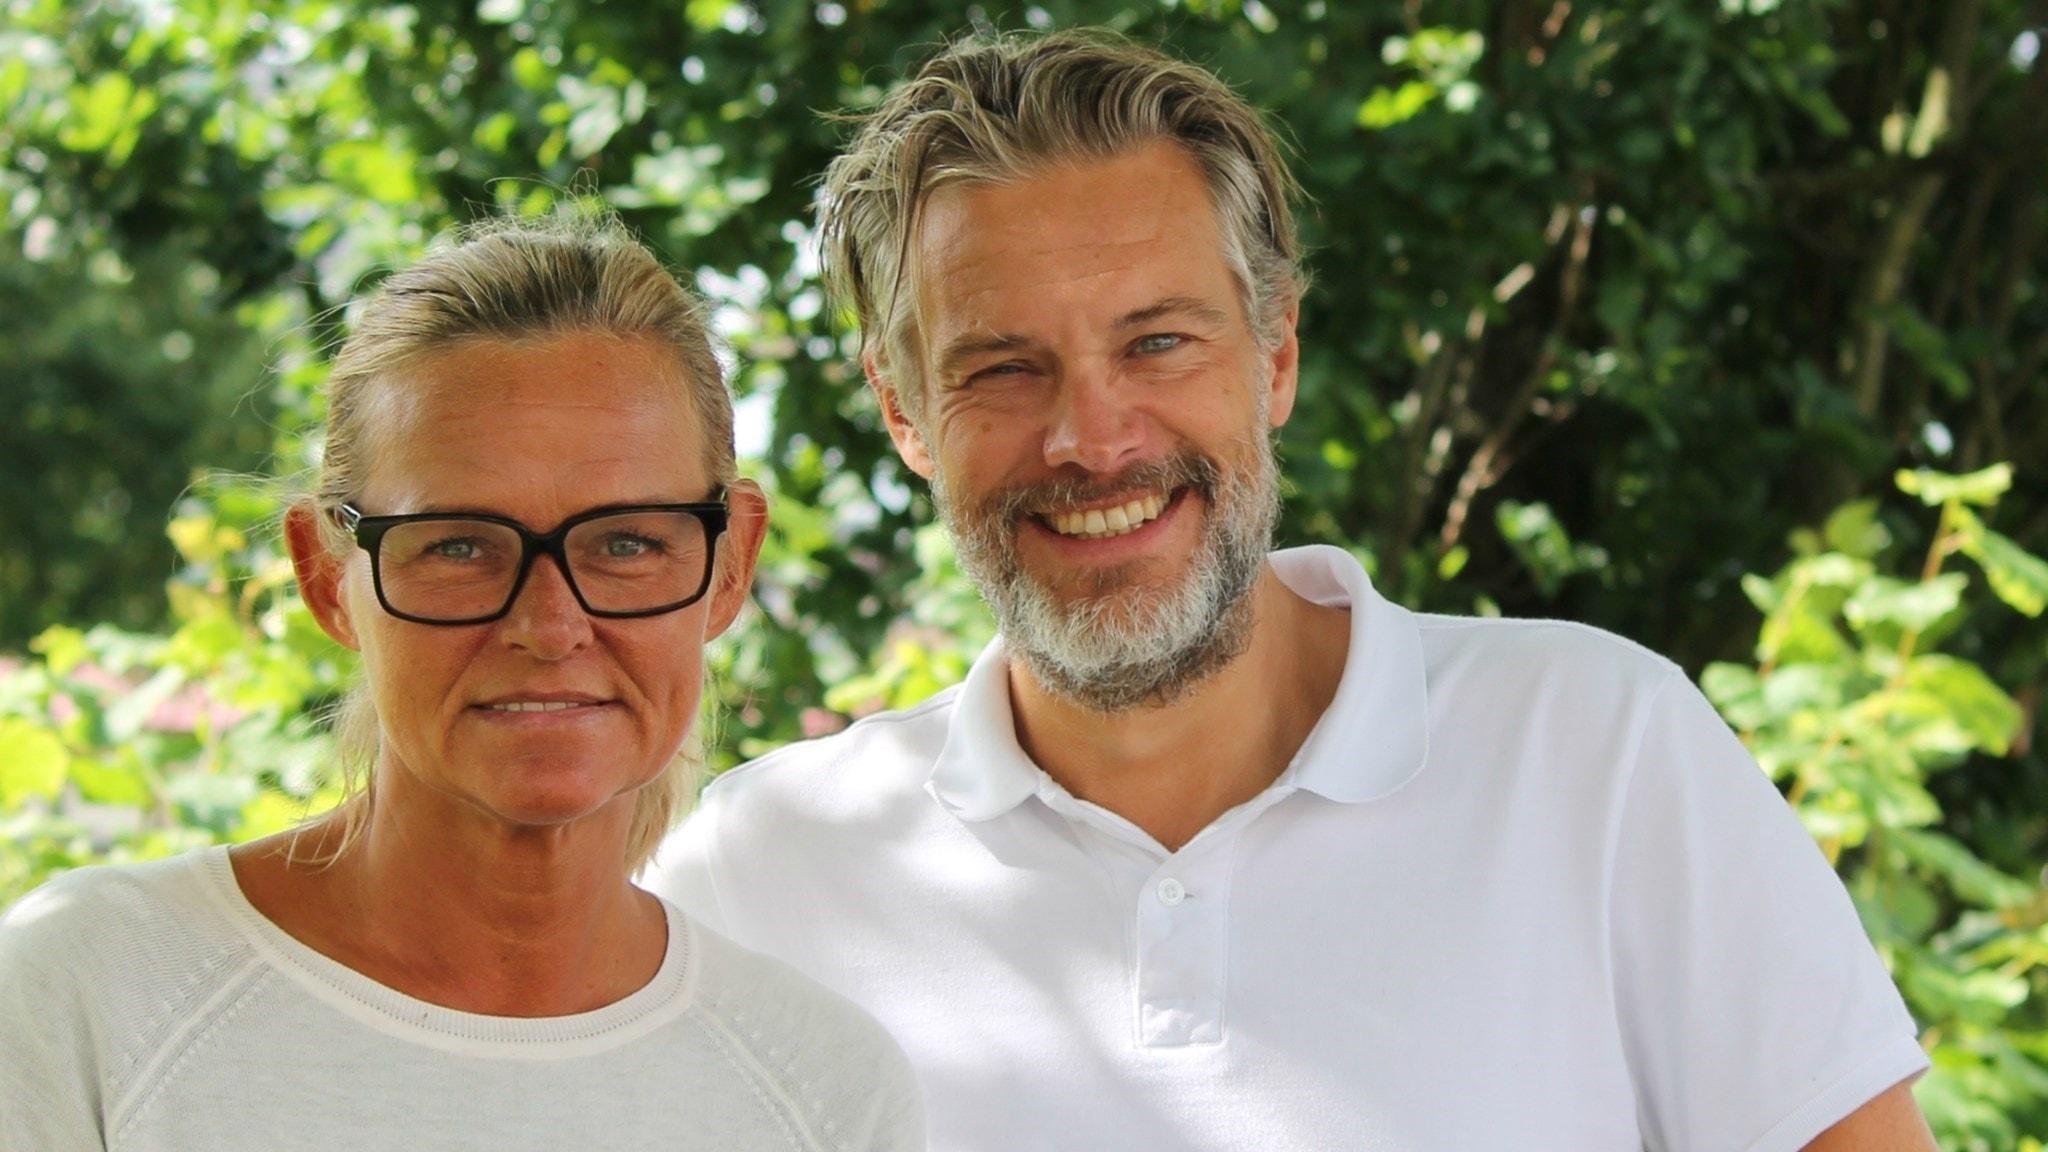 Med Fredrik B Ekdahl, Anne Marchal och Lars-Peter Hielle